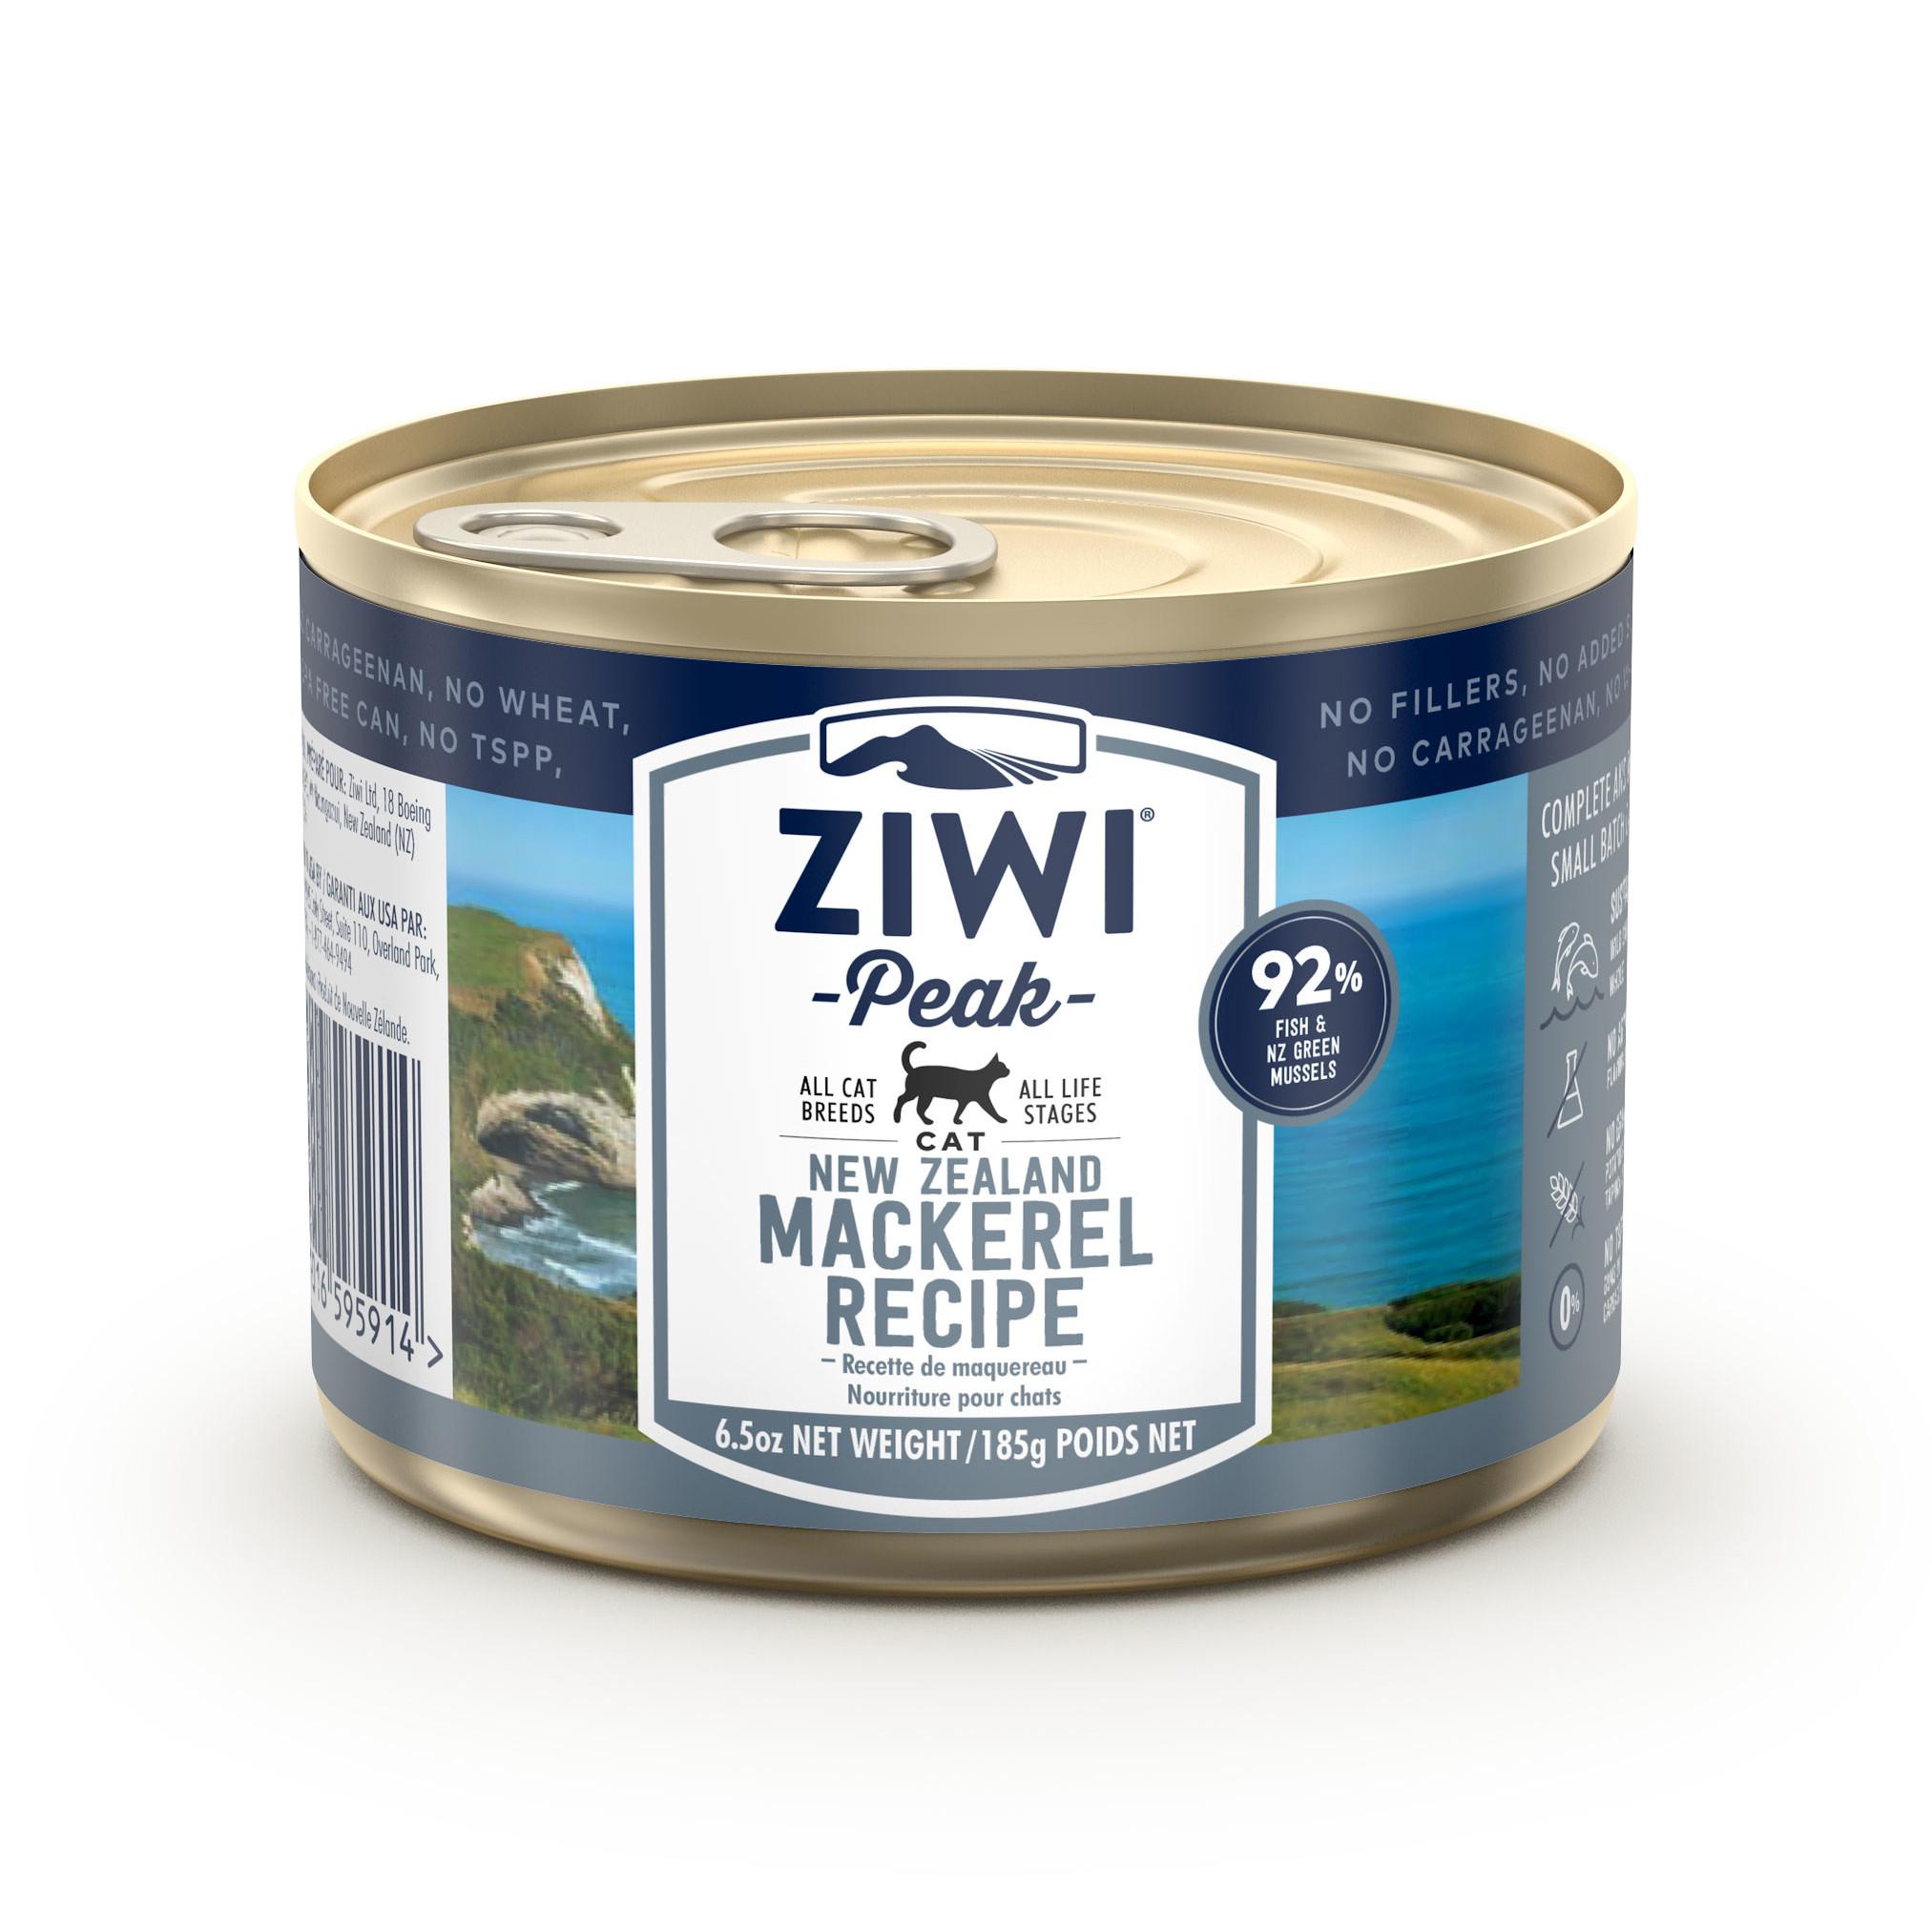 ZIWI Peak Canned Cat Food Mackerel Recipe, 6.5-oz|185-g